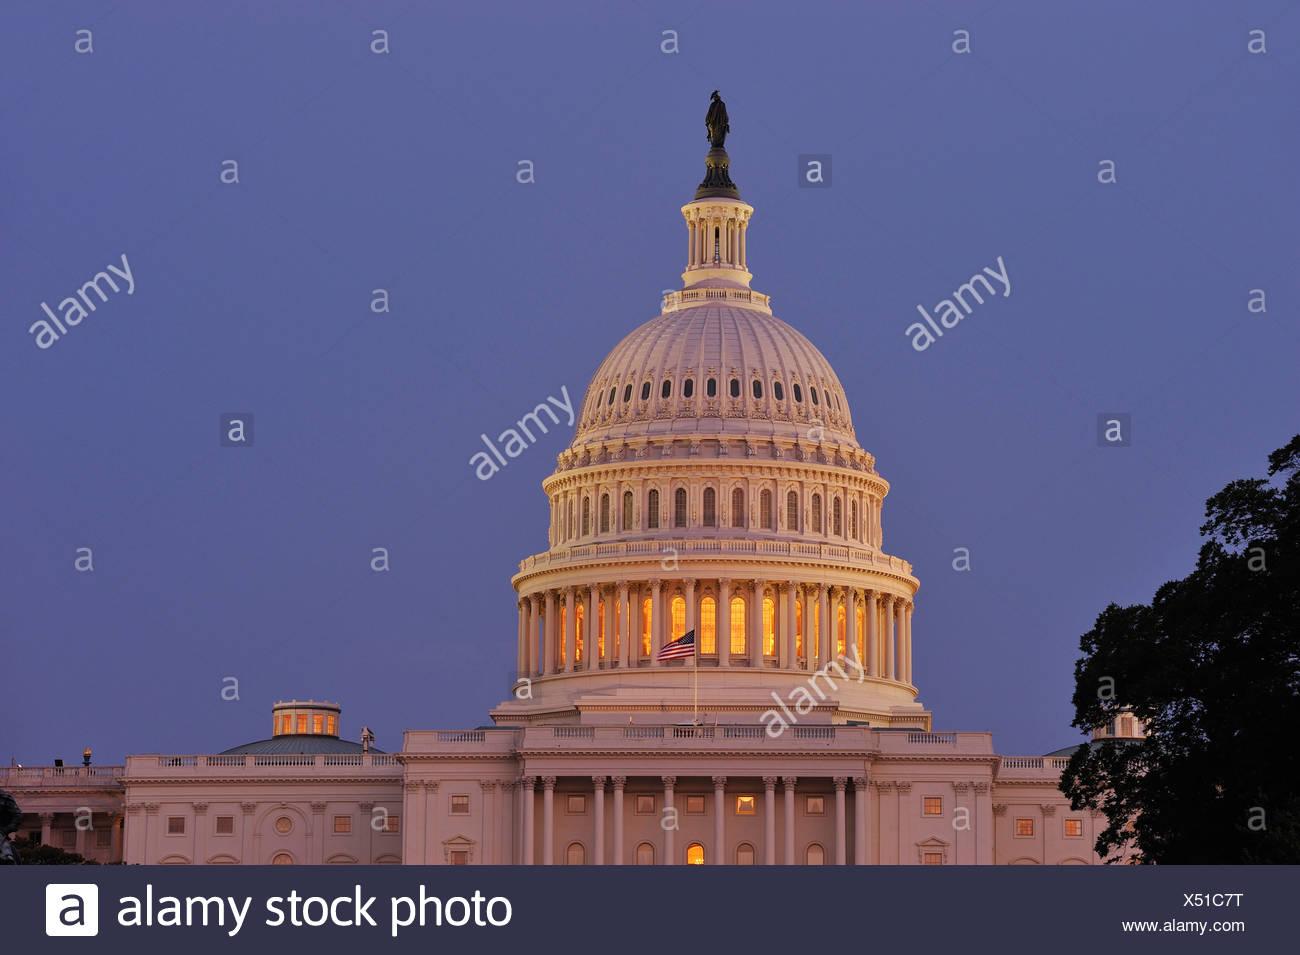 U.S. Capitol, The Mall, Washington D.C., District of Columbia, USA, United States, America, dome, night - Stock Image